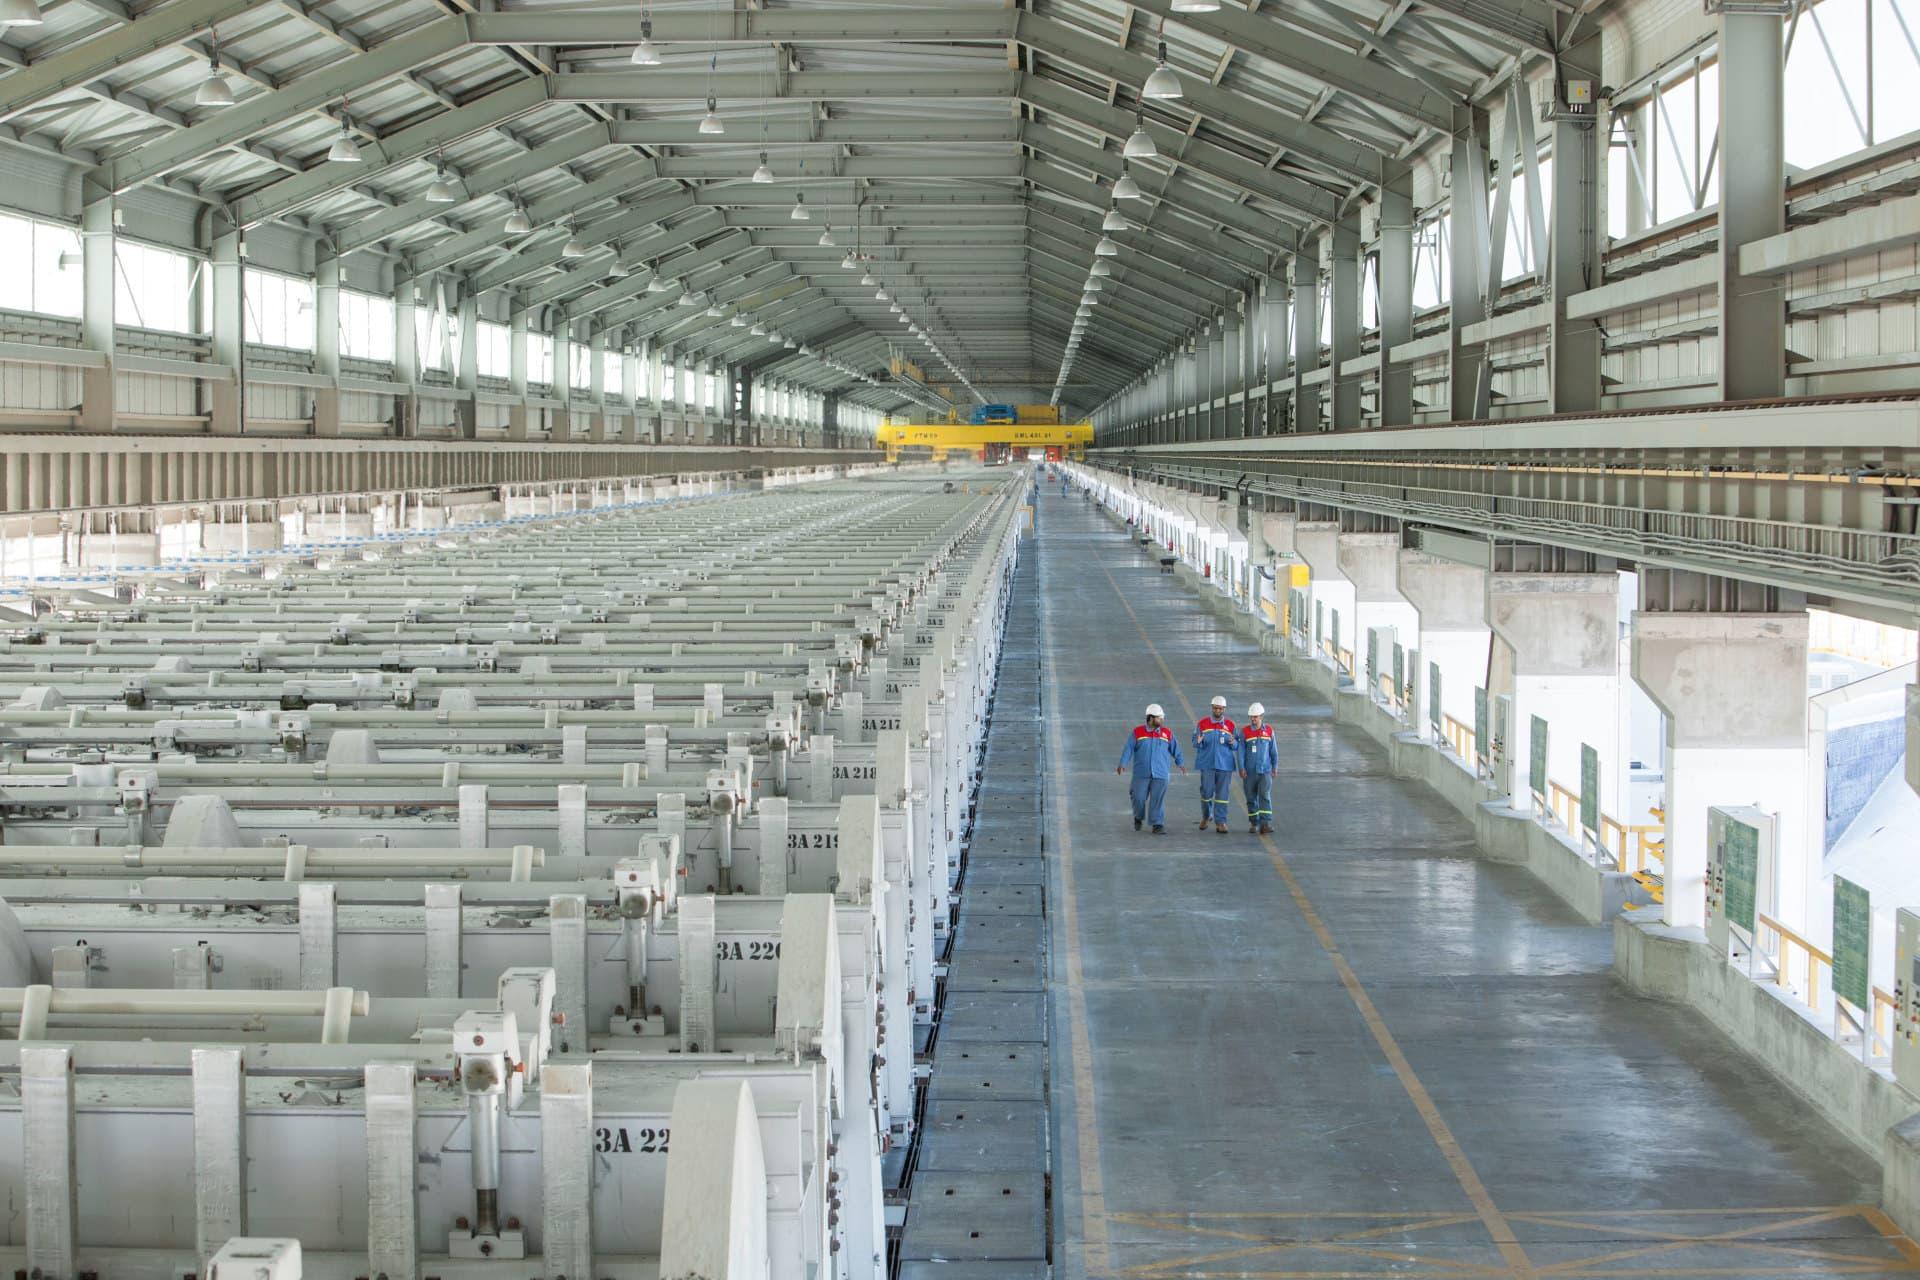 Bmw Aluminio Almacen Emiratos Arabes Unidos